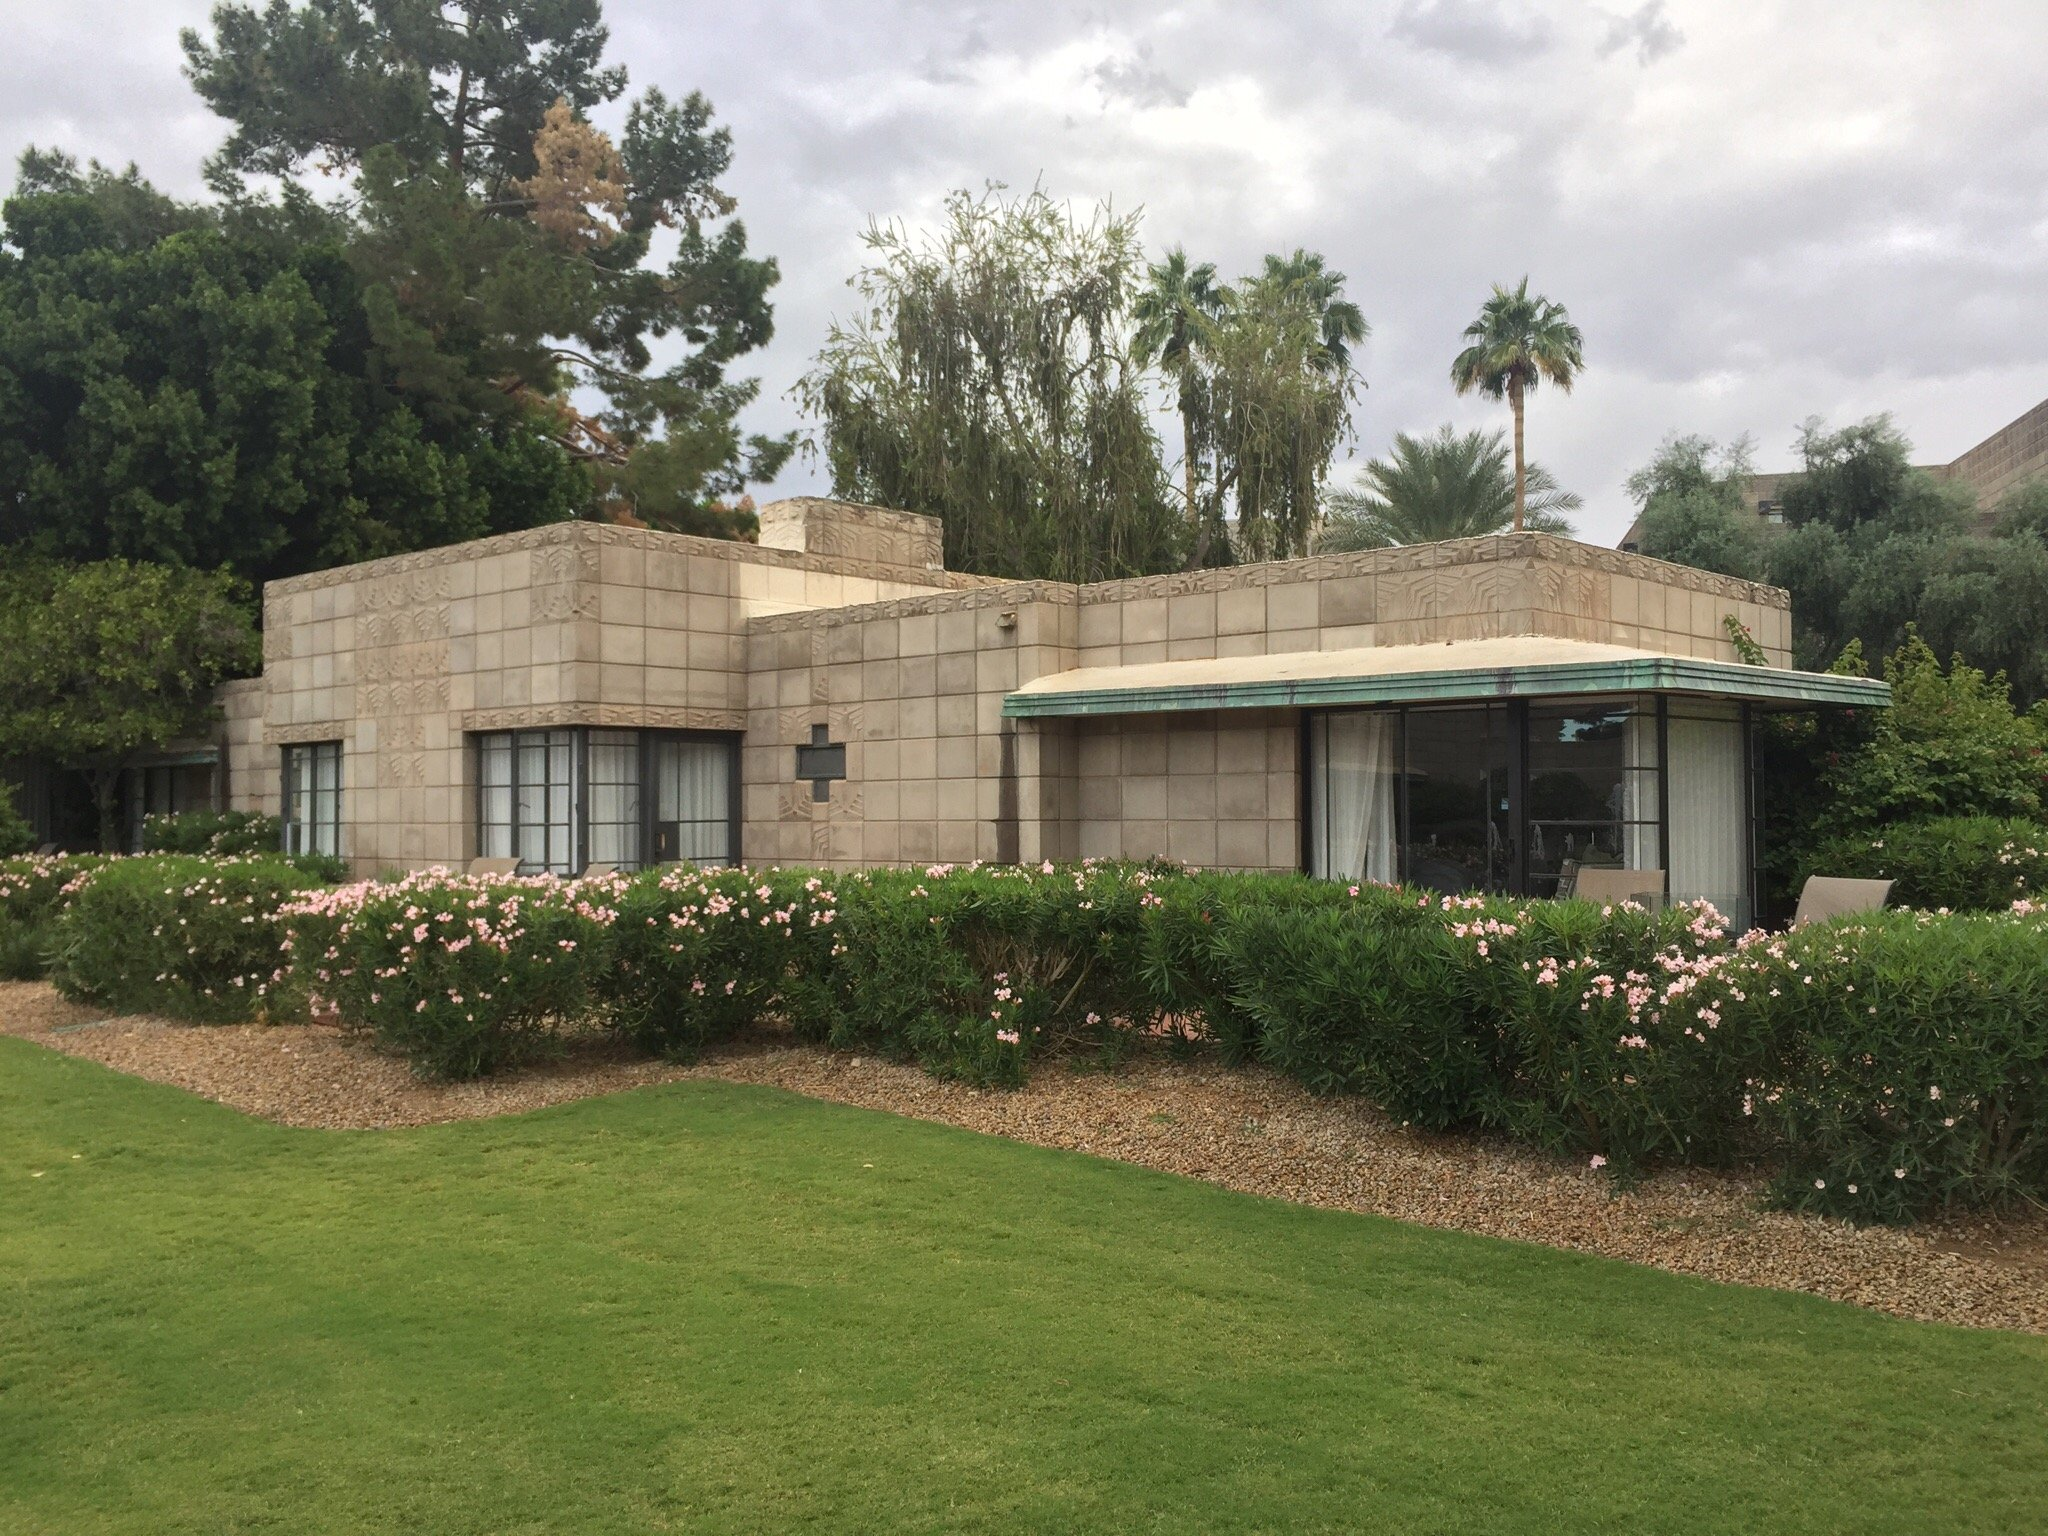 Arizona Biltmore Resort Adobe Course